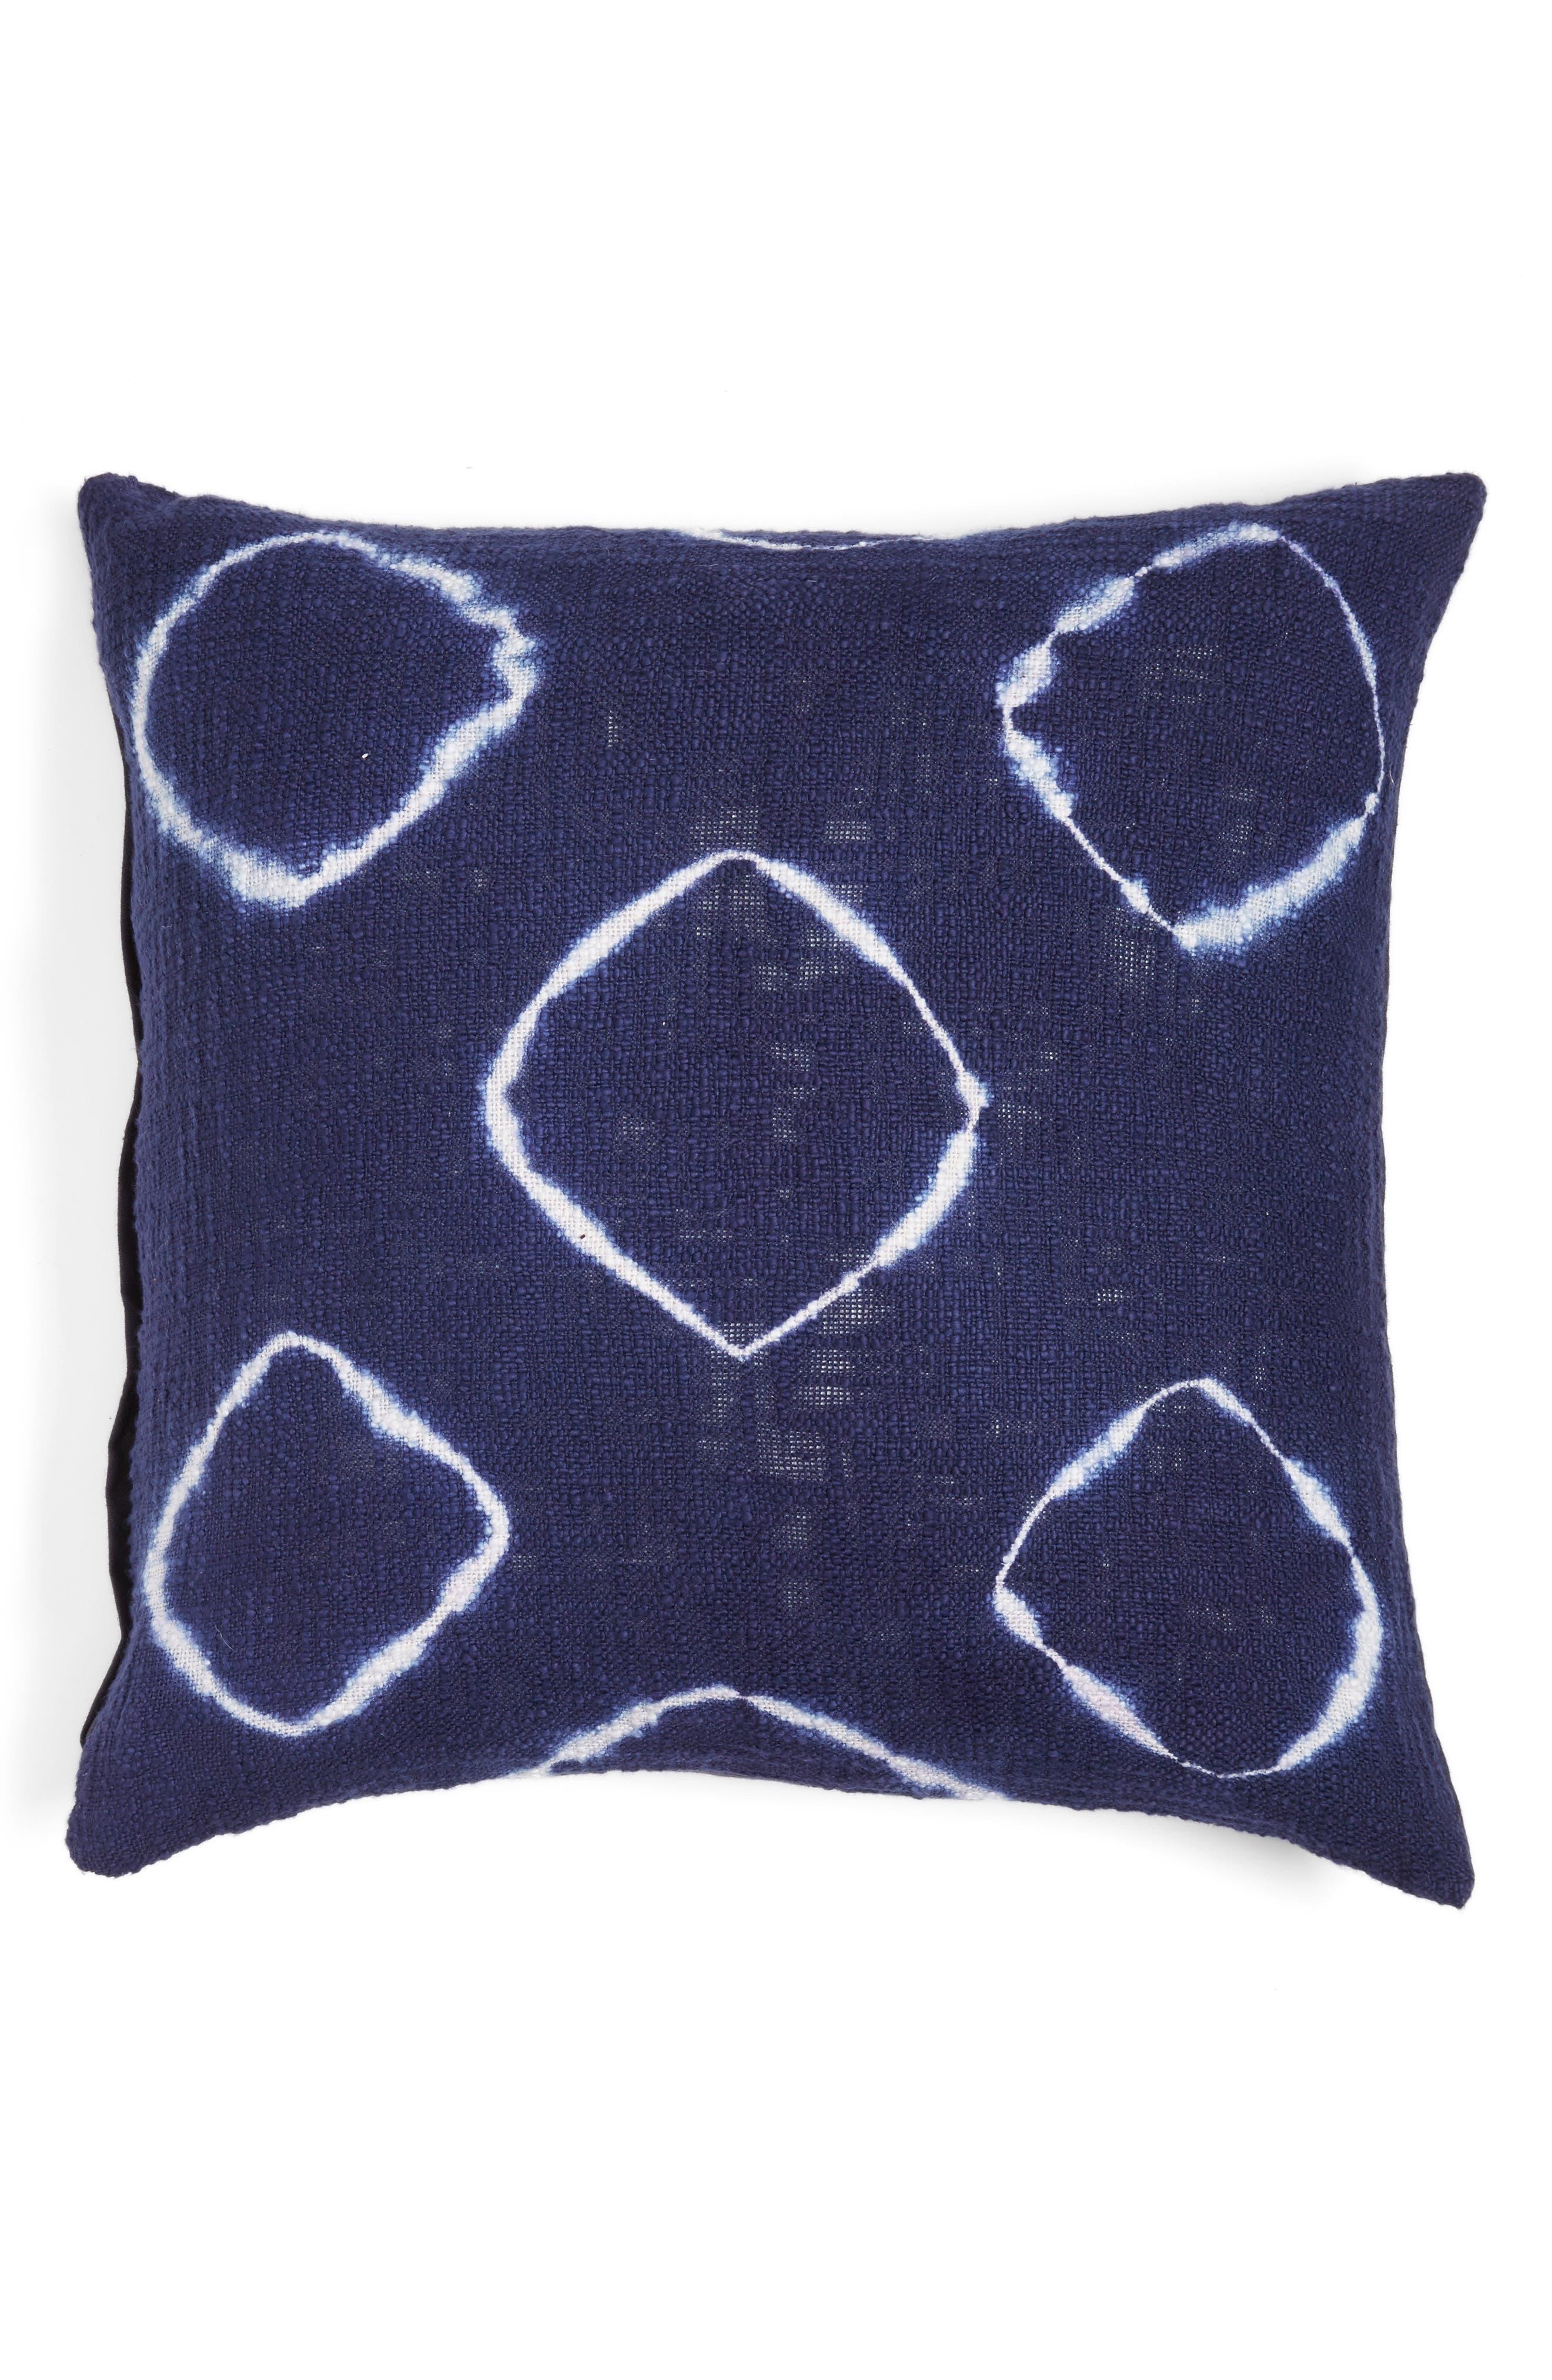 Medieval Blue Accent Pillow,                             Main thumbnail 1, color,                             400